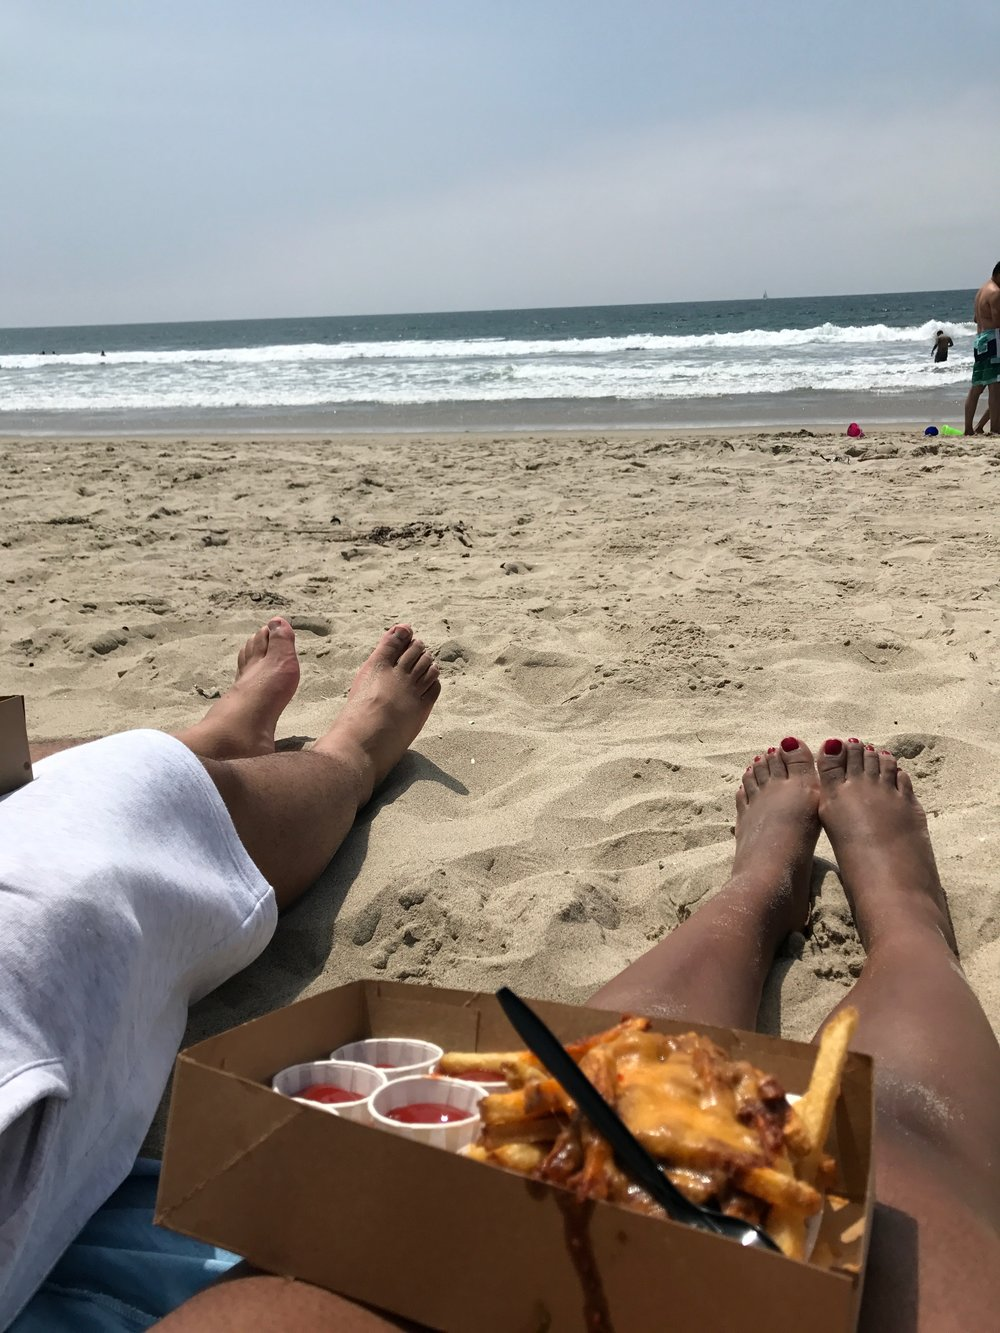 Beachin' with Babe